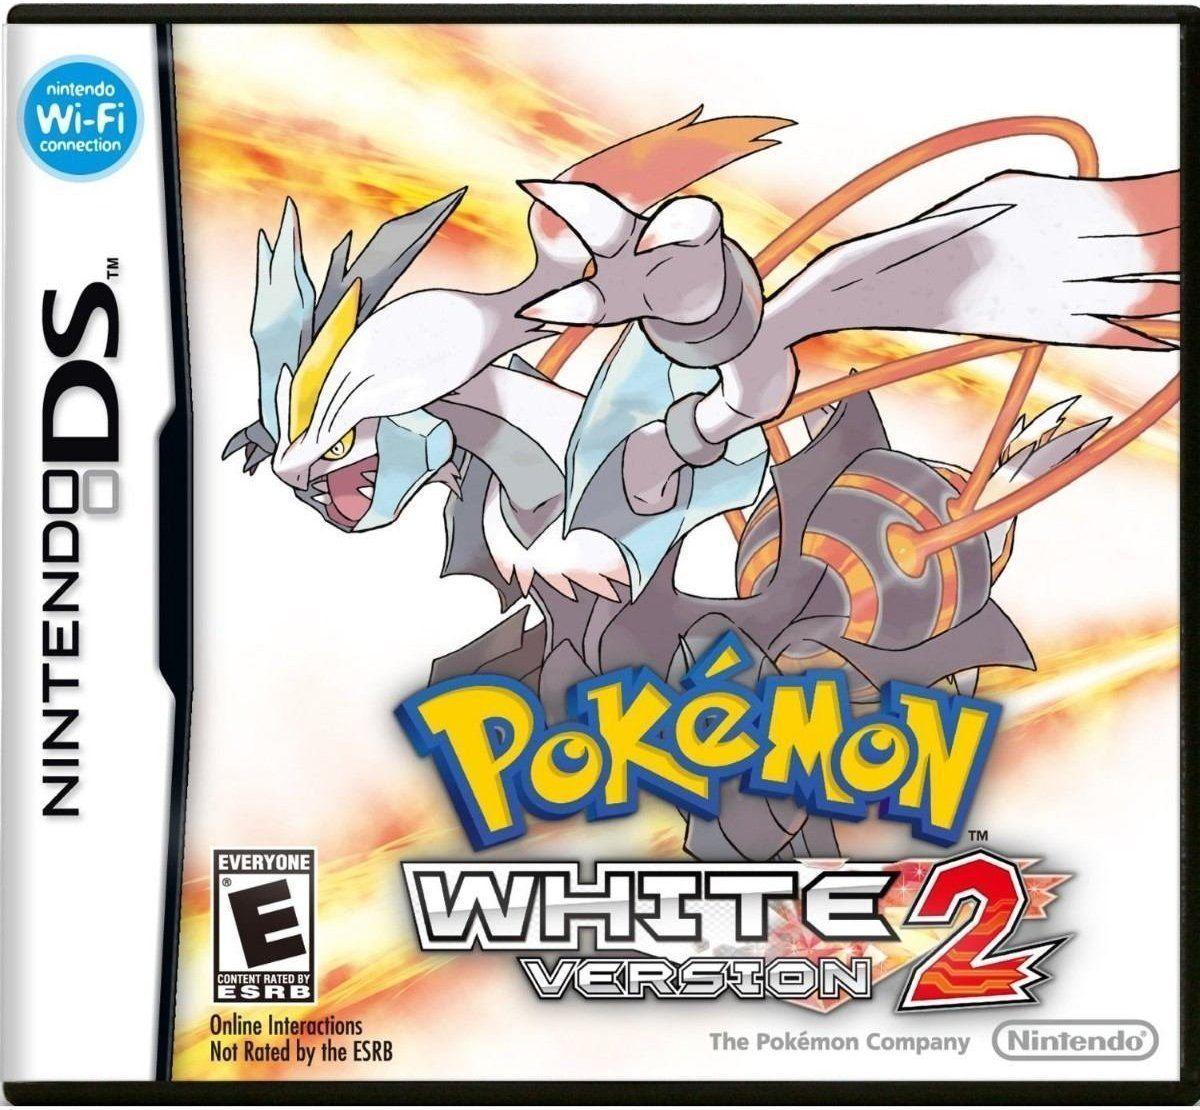 Pokemon White Version 2 Nintendo DS Video Game [Used Good]